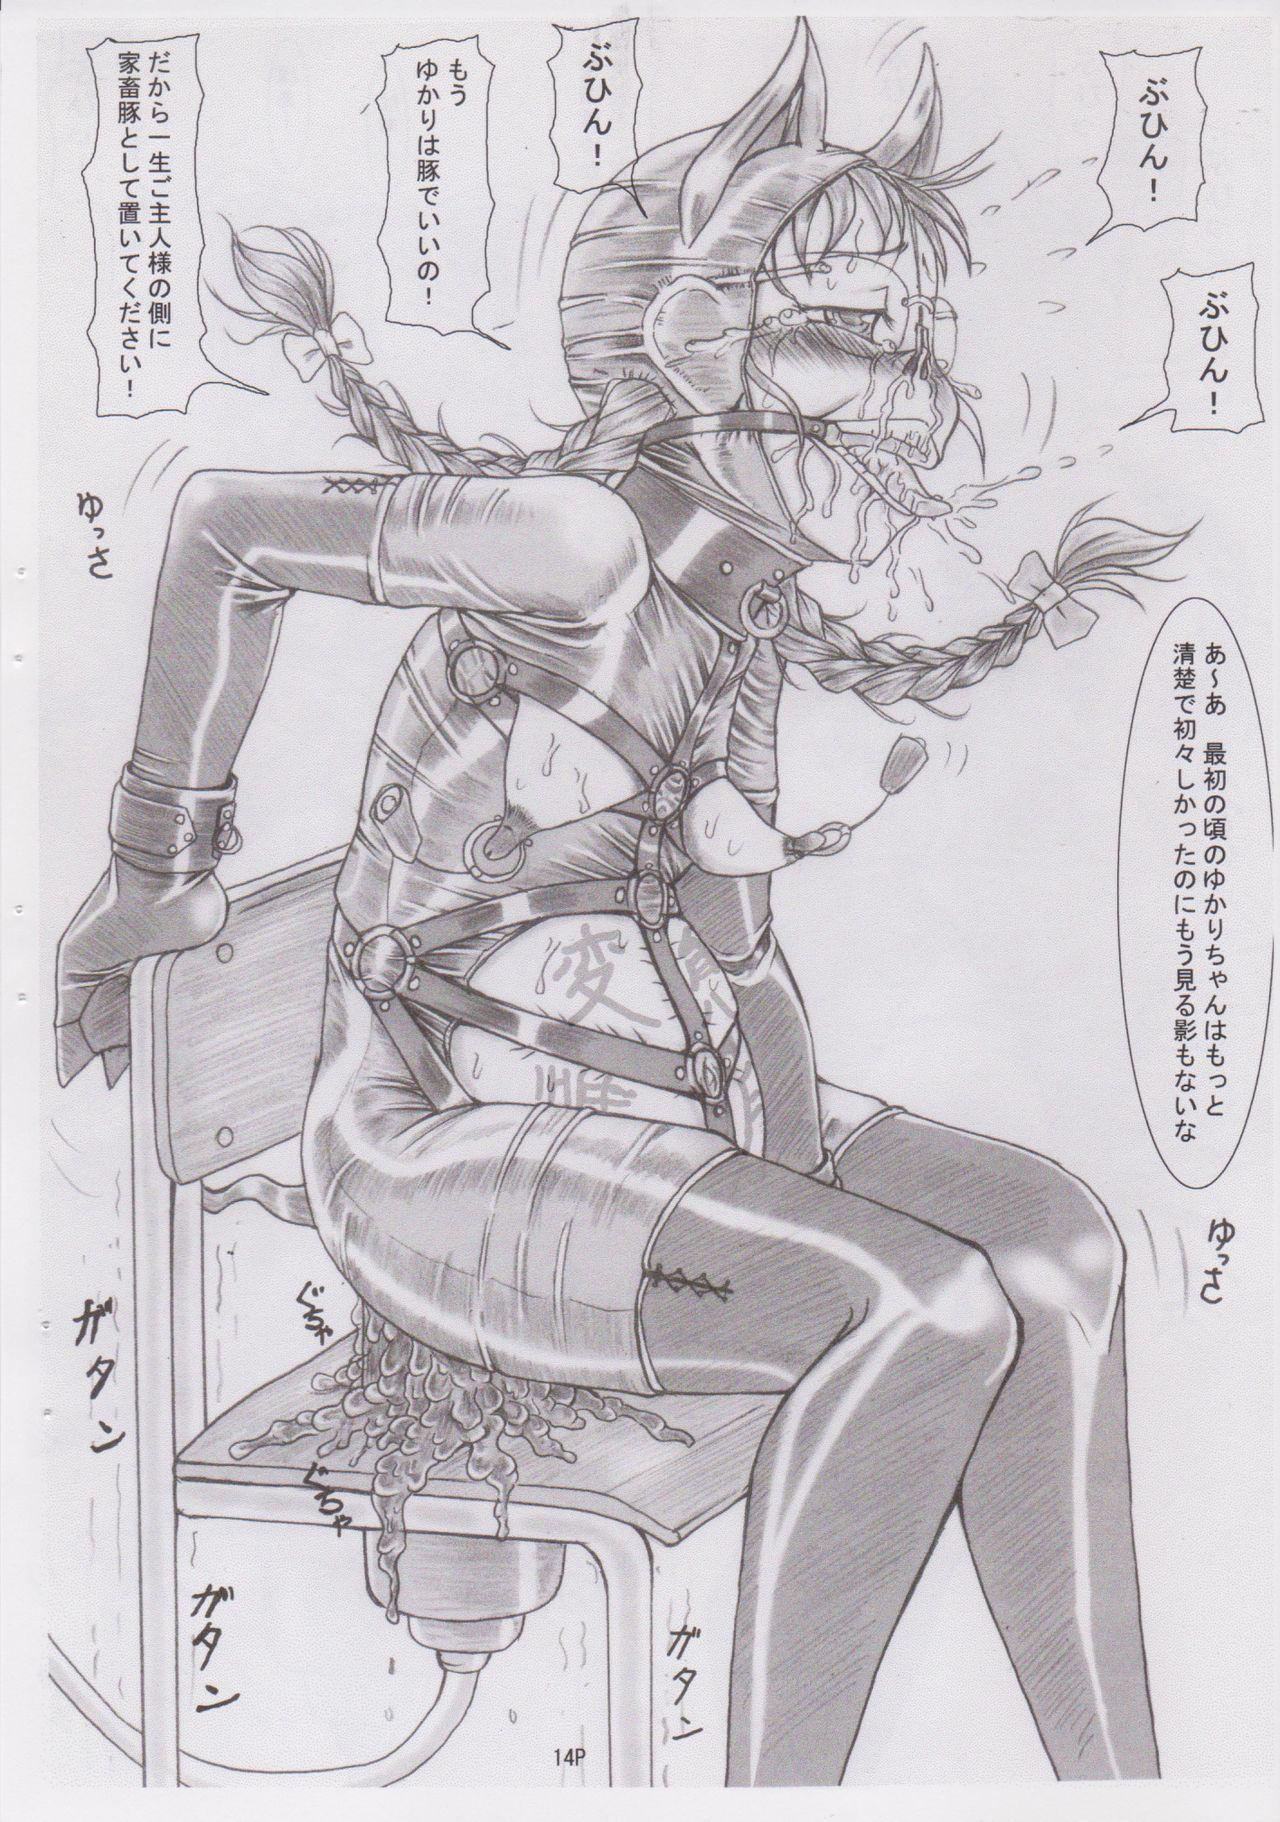 (C78) [Nekoneko Panchu! (Nekoneko Panchu)] Sanshimai Choukyou Yuugi [Yukari Hen] Yukari-chan no Butabana Kachiku Choukyou [Anal Higyaku Jugyou] 13